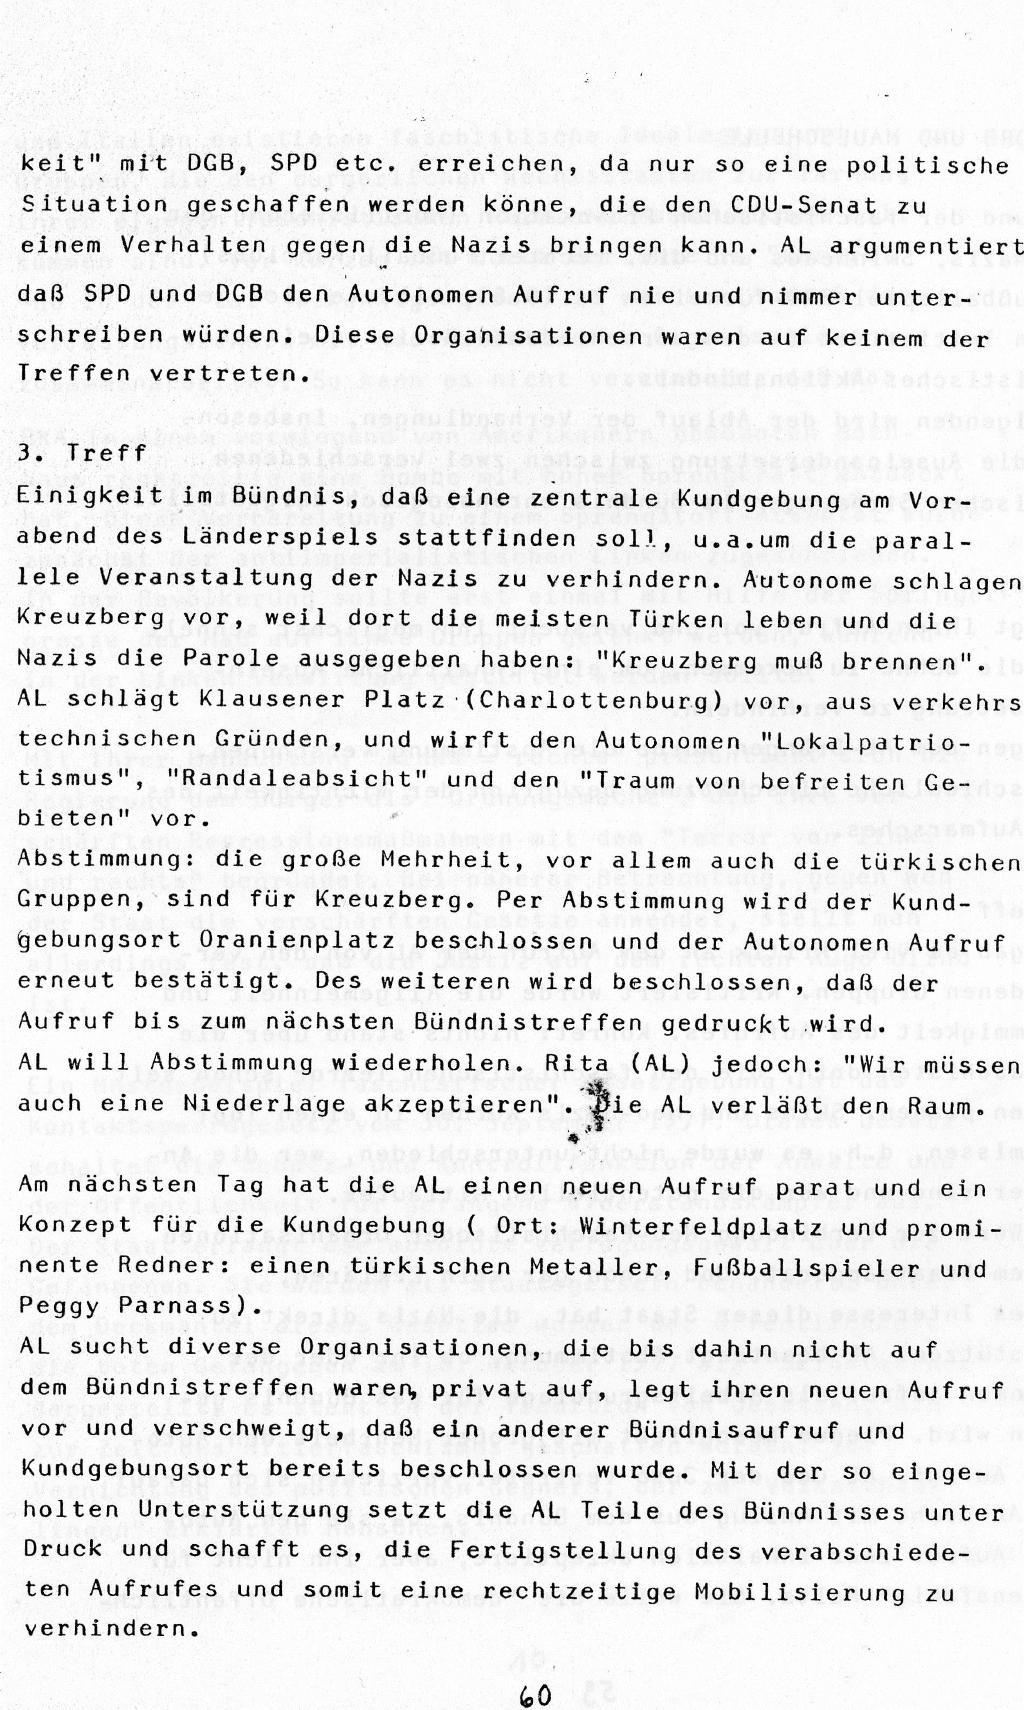 Berlin_1983_Autonome_Gruppen_Faschismus_im_Kapitalismus_60